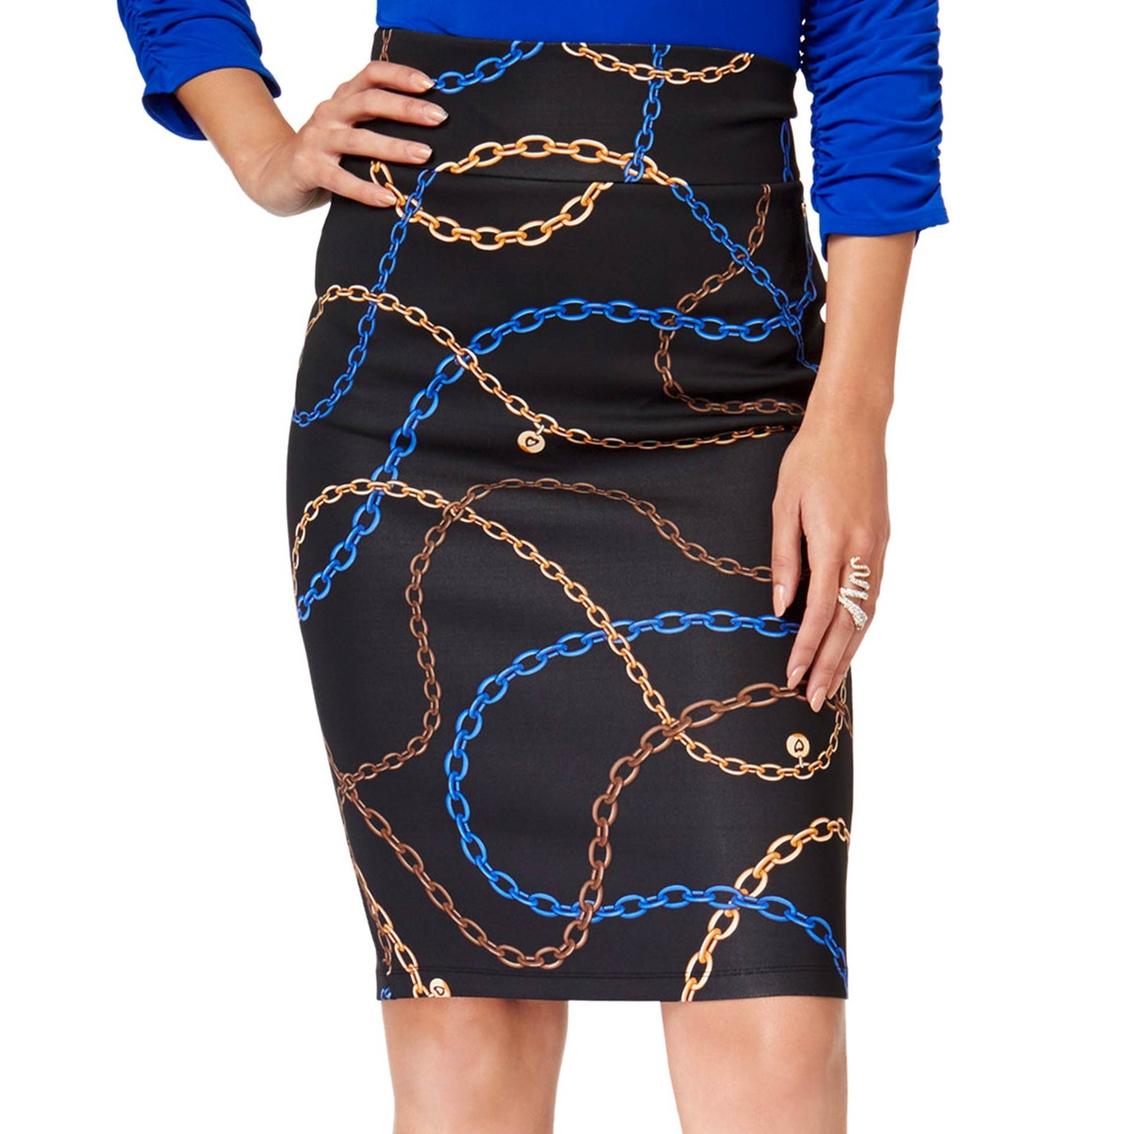 2ec9f8069 Thalia Sodi Printed Scuba Pencil Skirt | Skirts | Apparel | Shop The ...